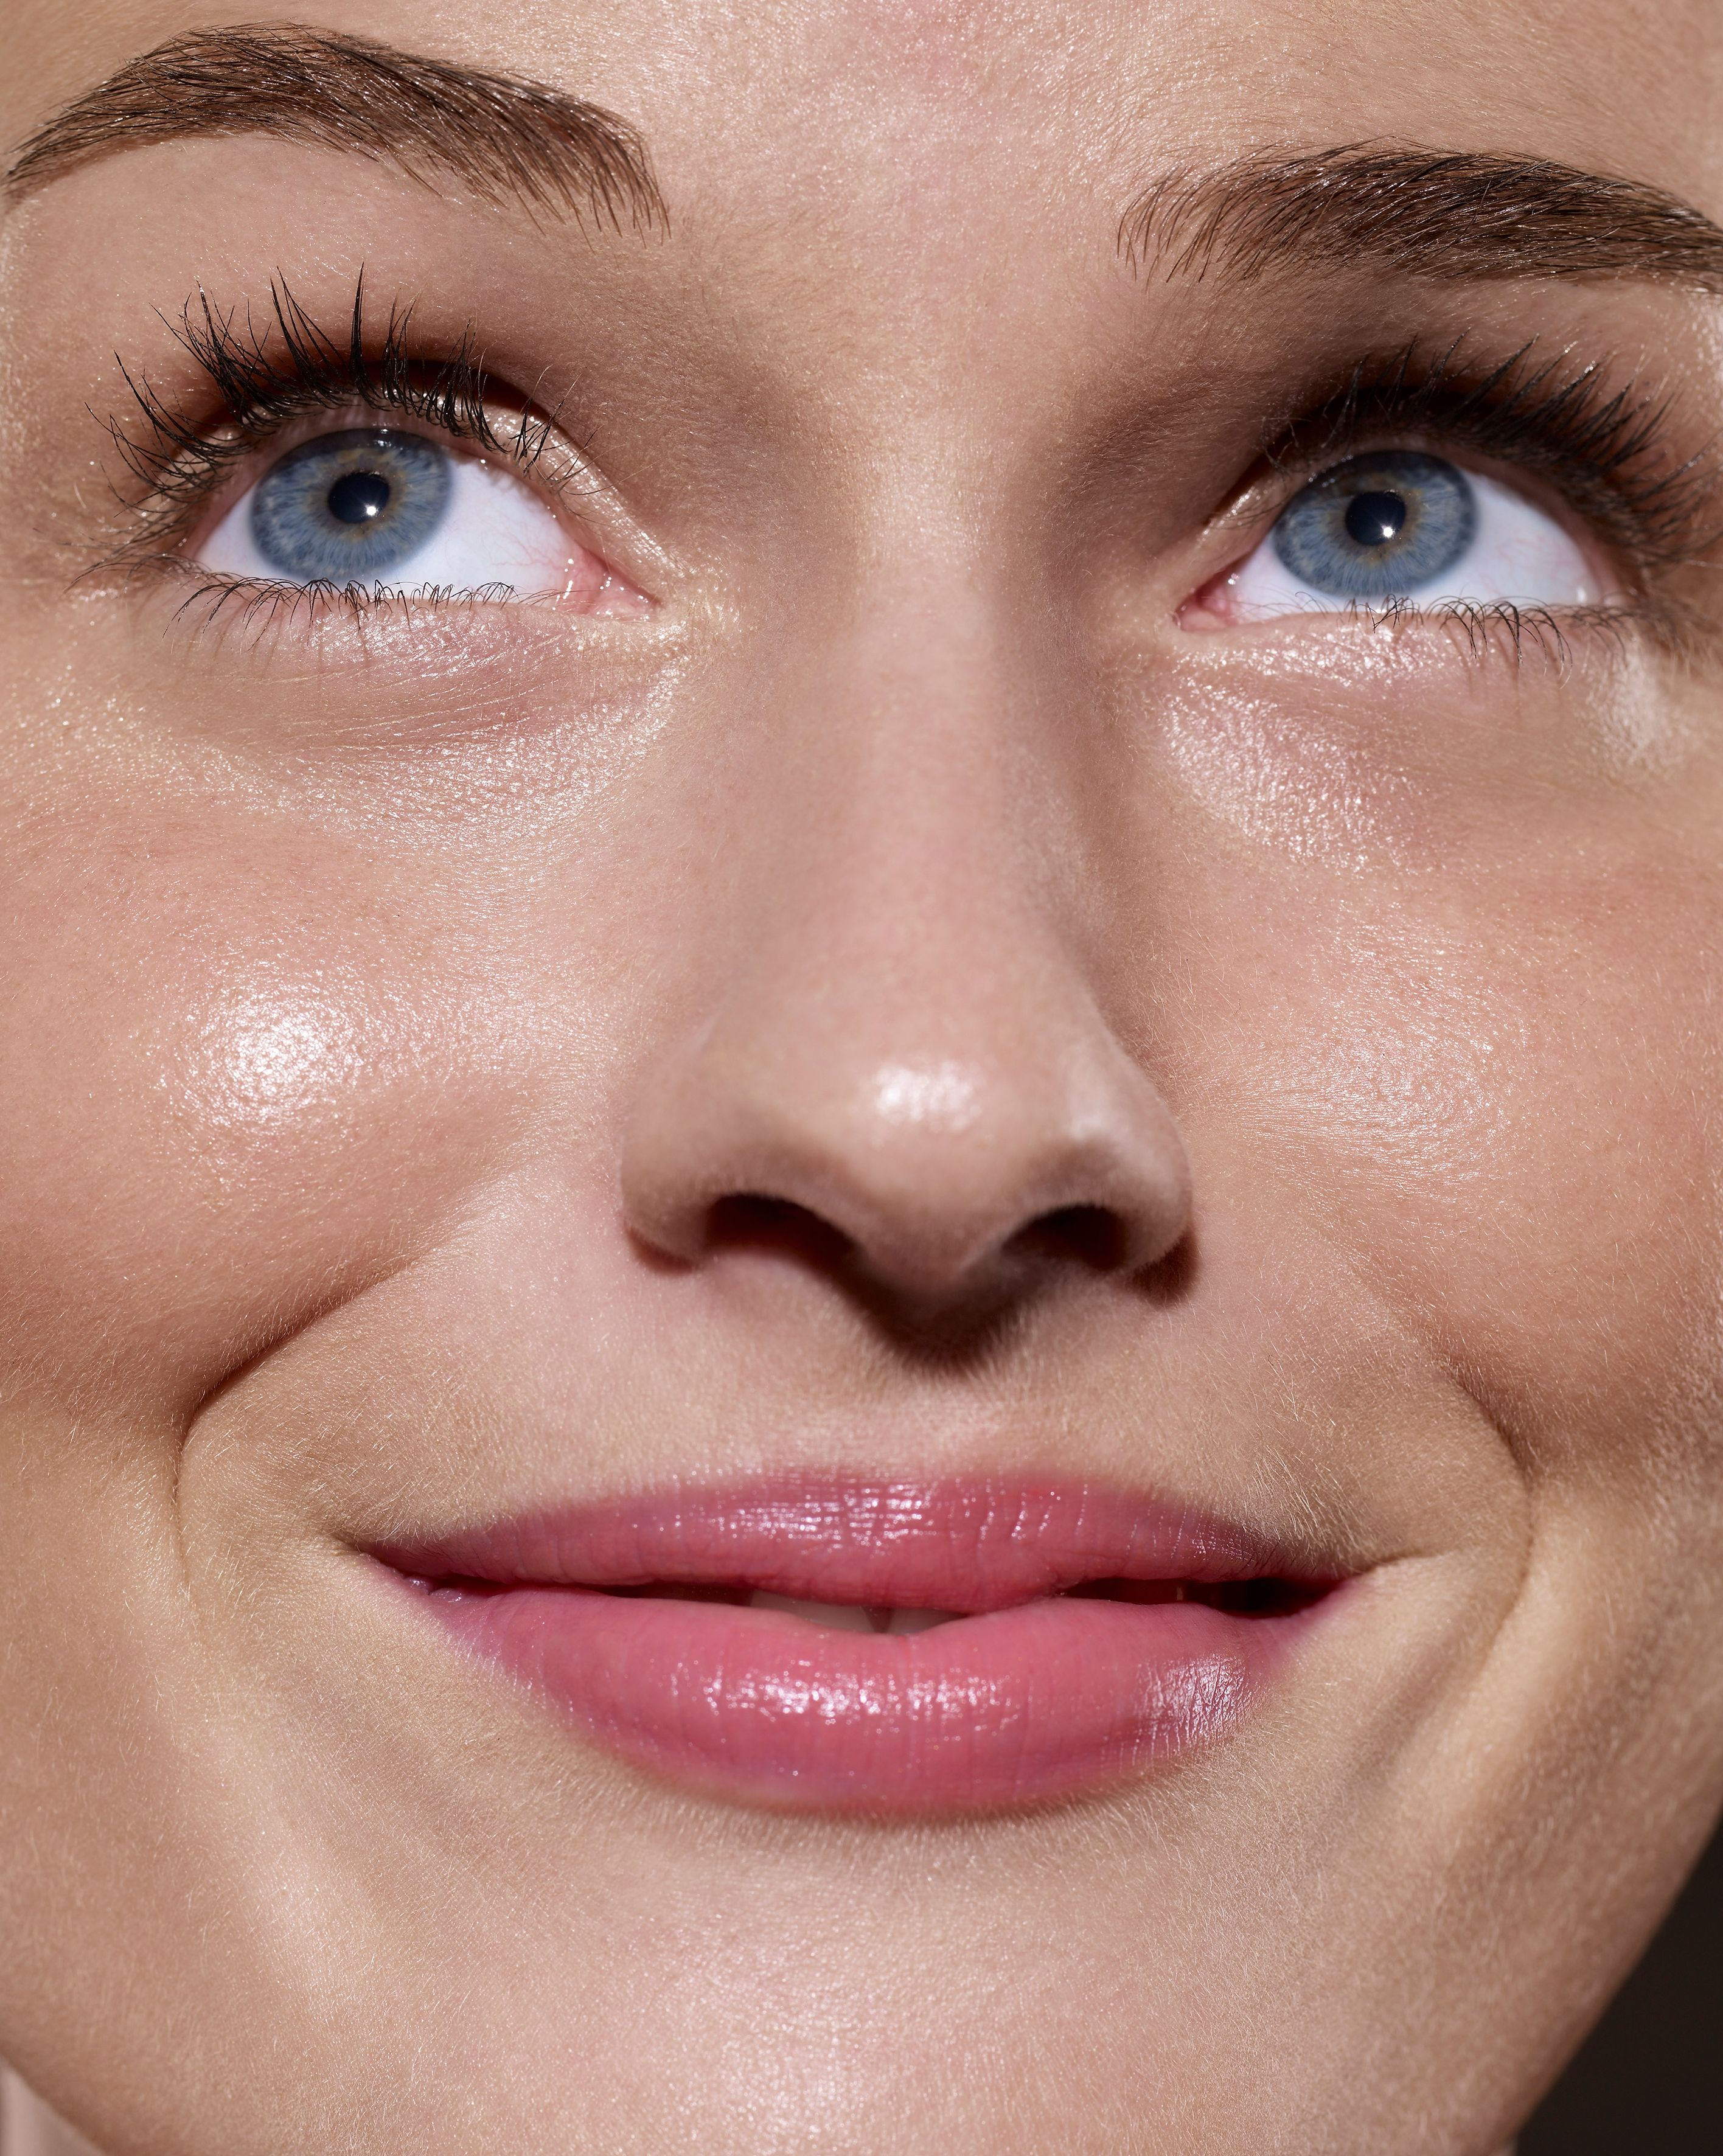 13,000 People Swear Baebody Eye Gel Erases Their Dark Circles